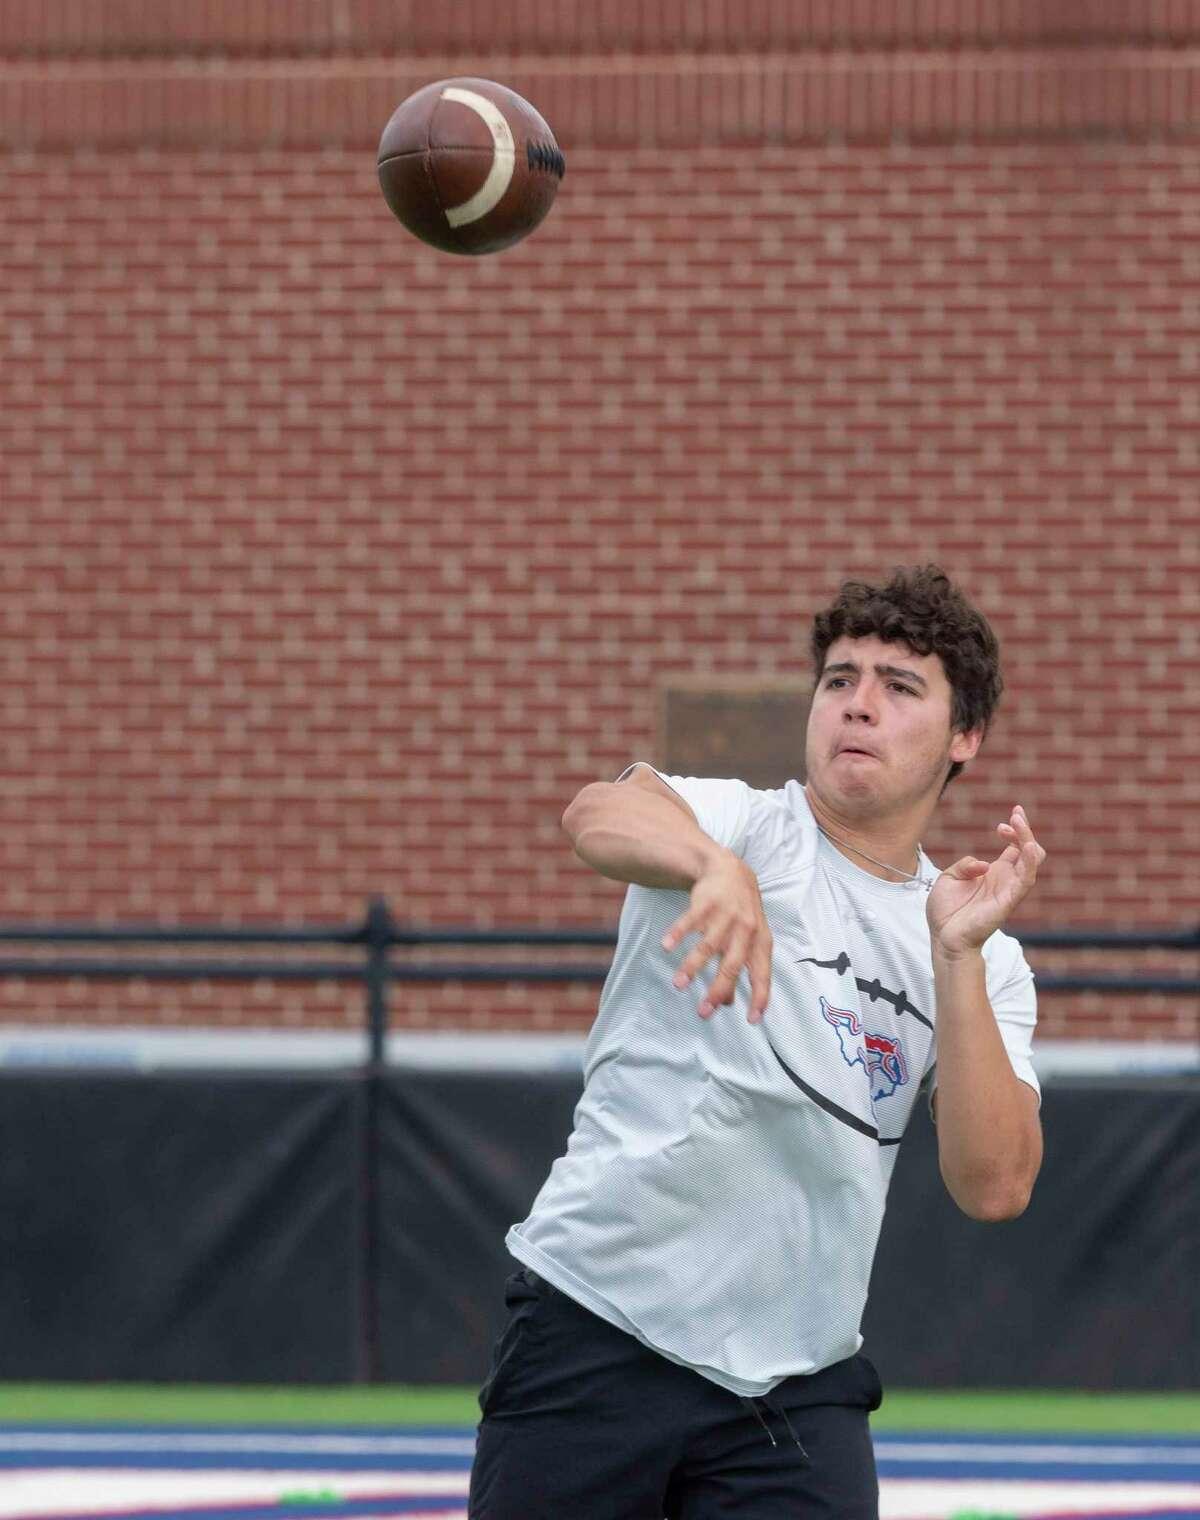 Midland Christian quarterback Ryver Rodriguez throws passes 06/21/2021 during MCS 7-on-7 practice. Tim Fischer/Reporter-Telegram